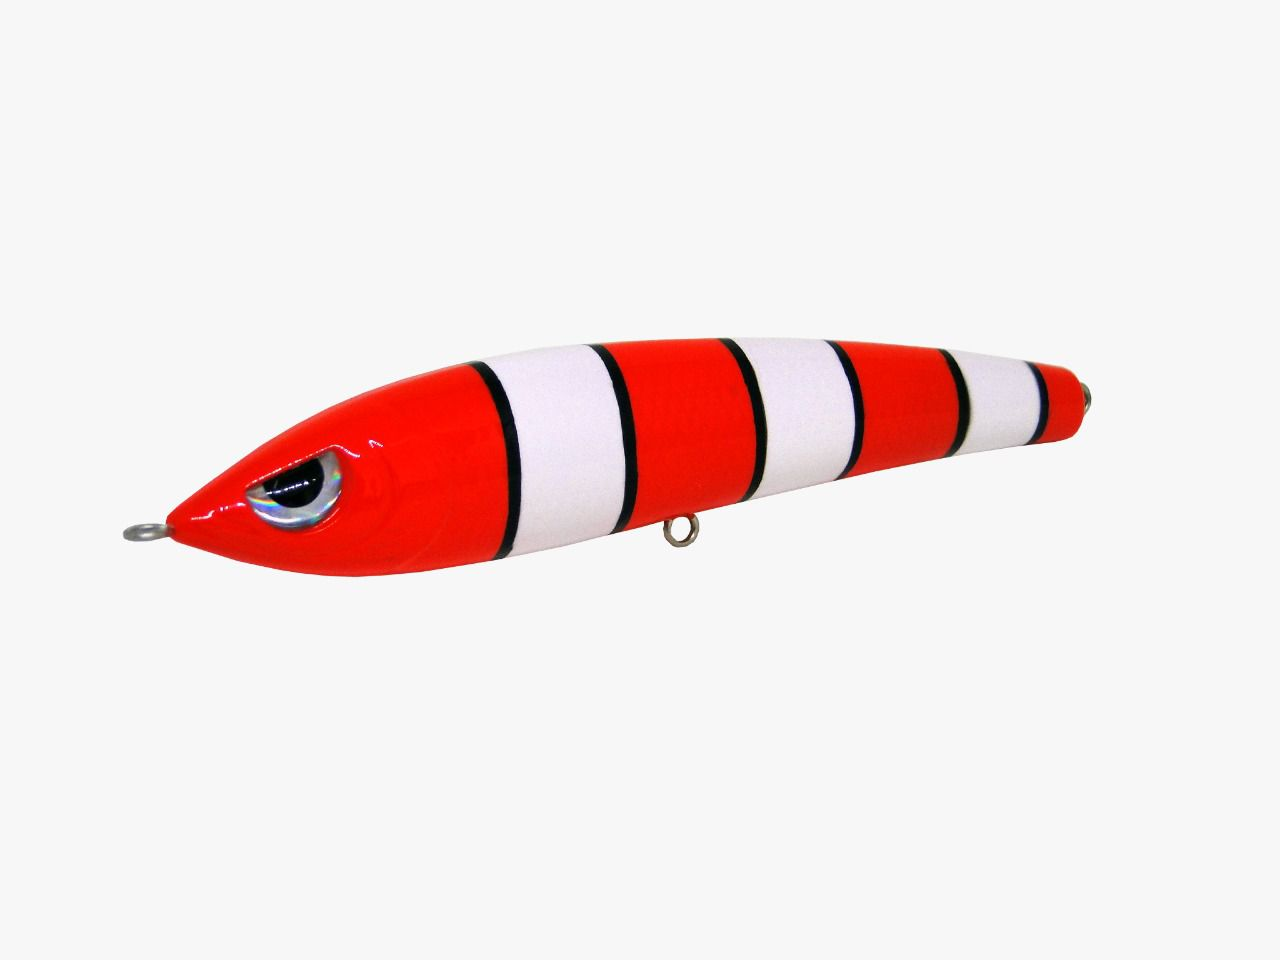 Isca Artificial Hunter Bait 11cm Cobra Coral 14g Yara